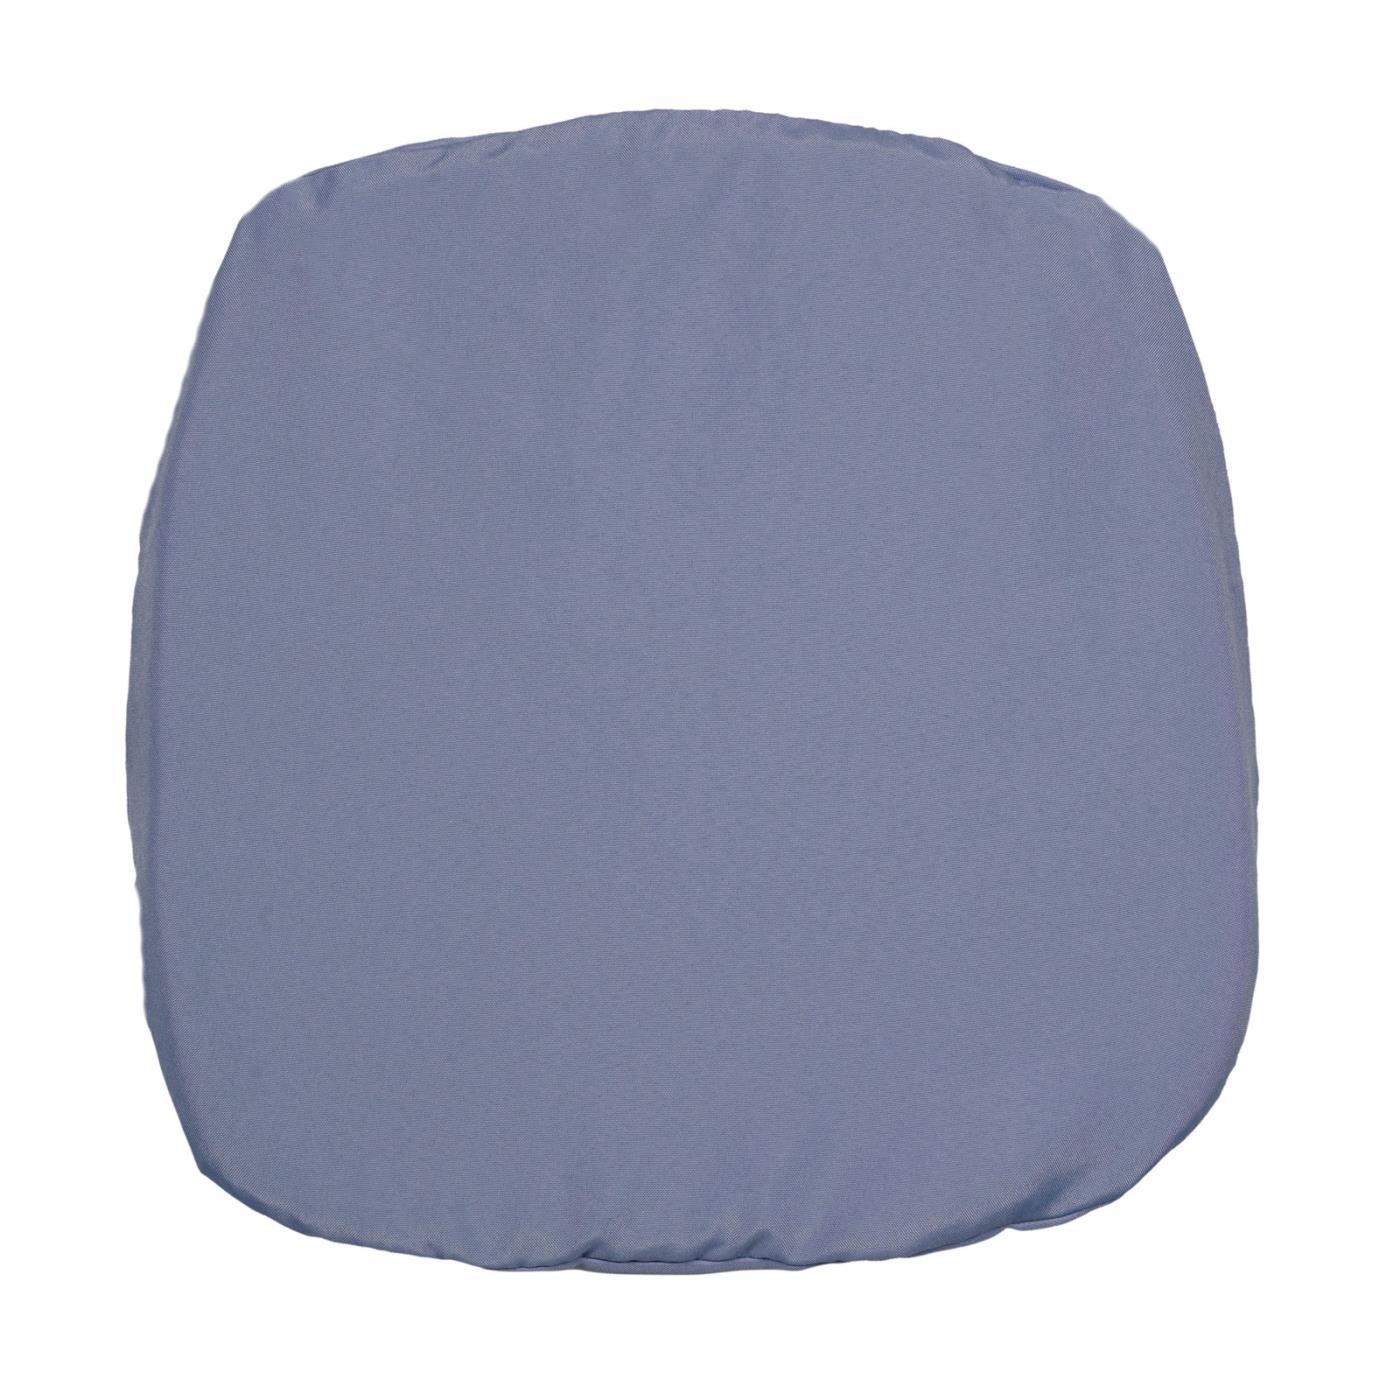 Poly Seat Cushion - Slate